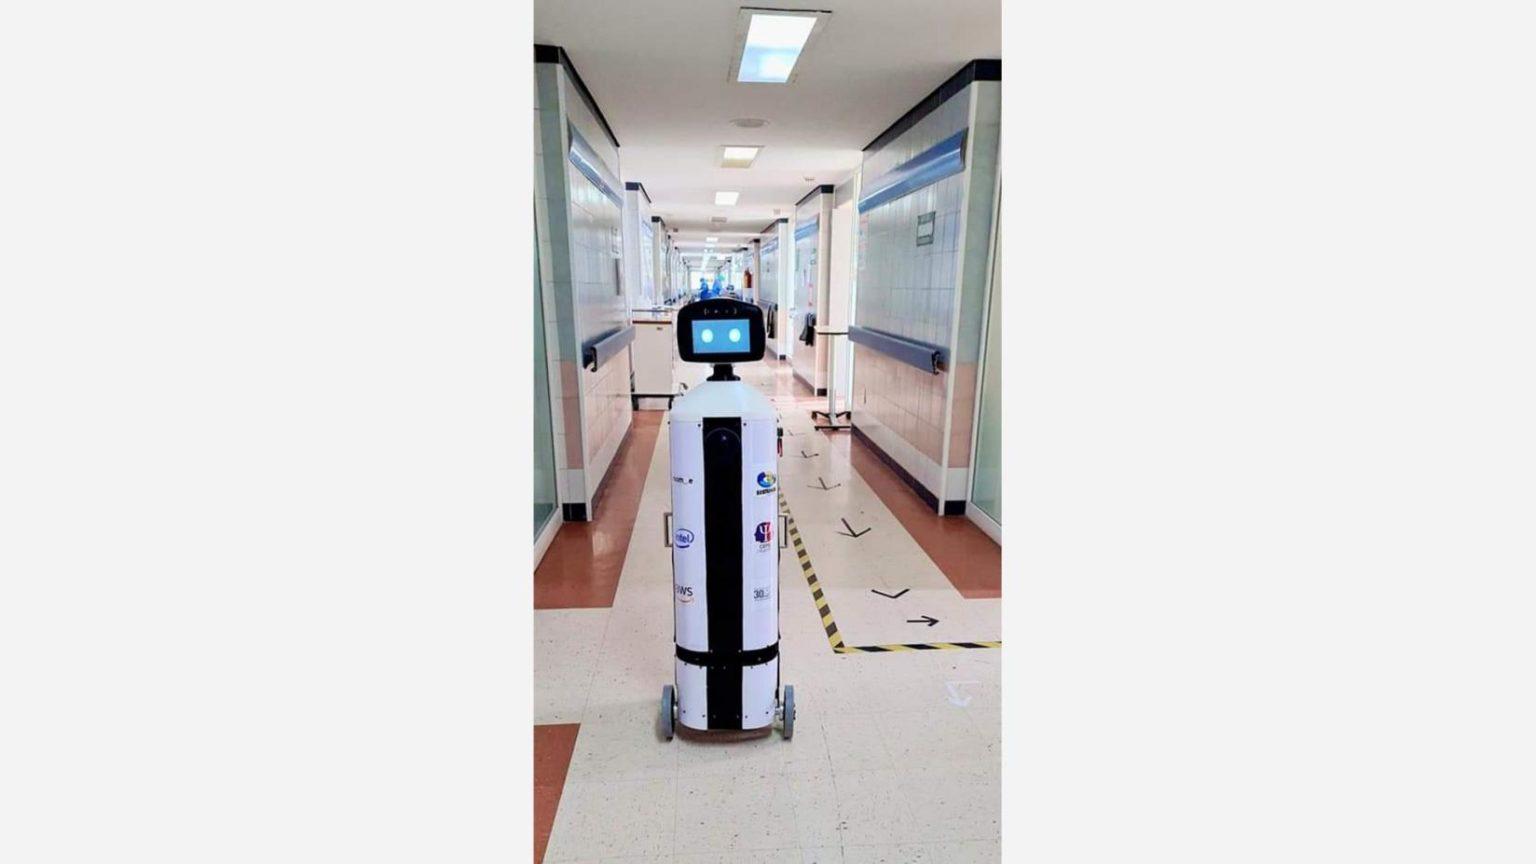 roomie-service-robot-2-16×9.jpg.rendition.intel.web.1648.927 222